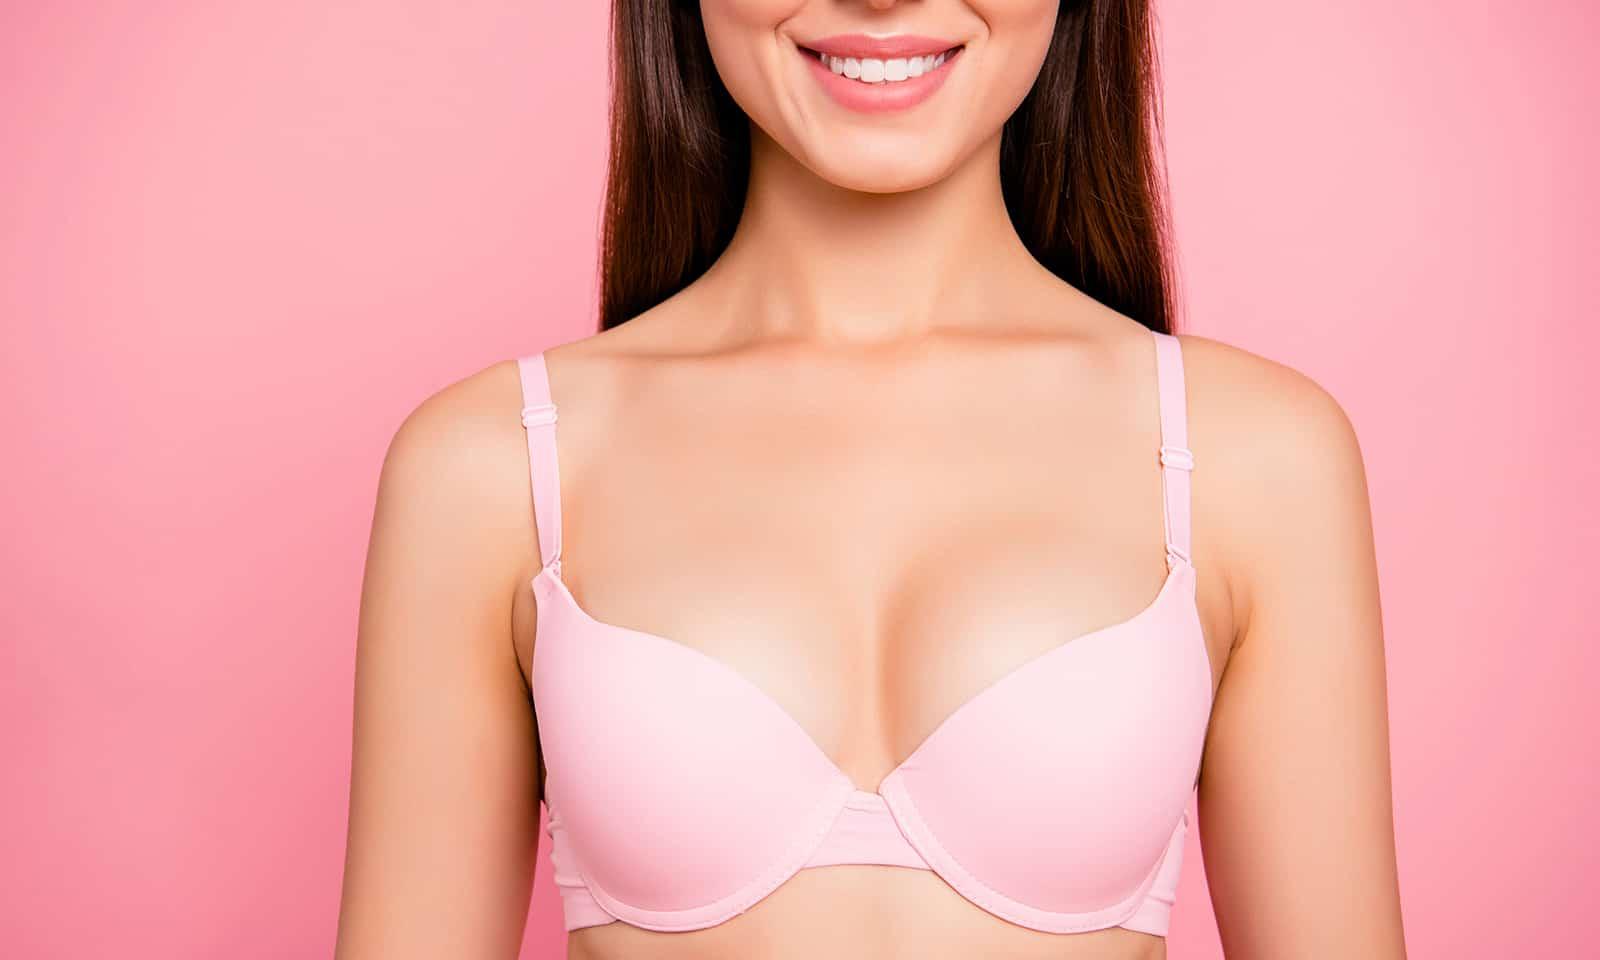 feel-confident-in-your-underwear-main-image-girl-happy-in-bra